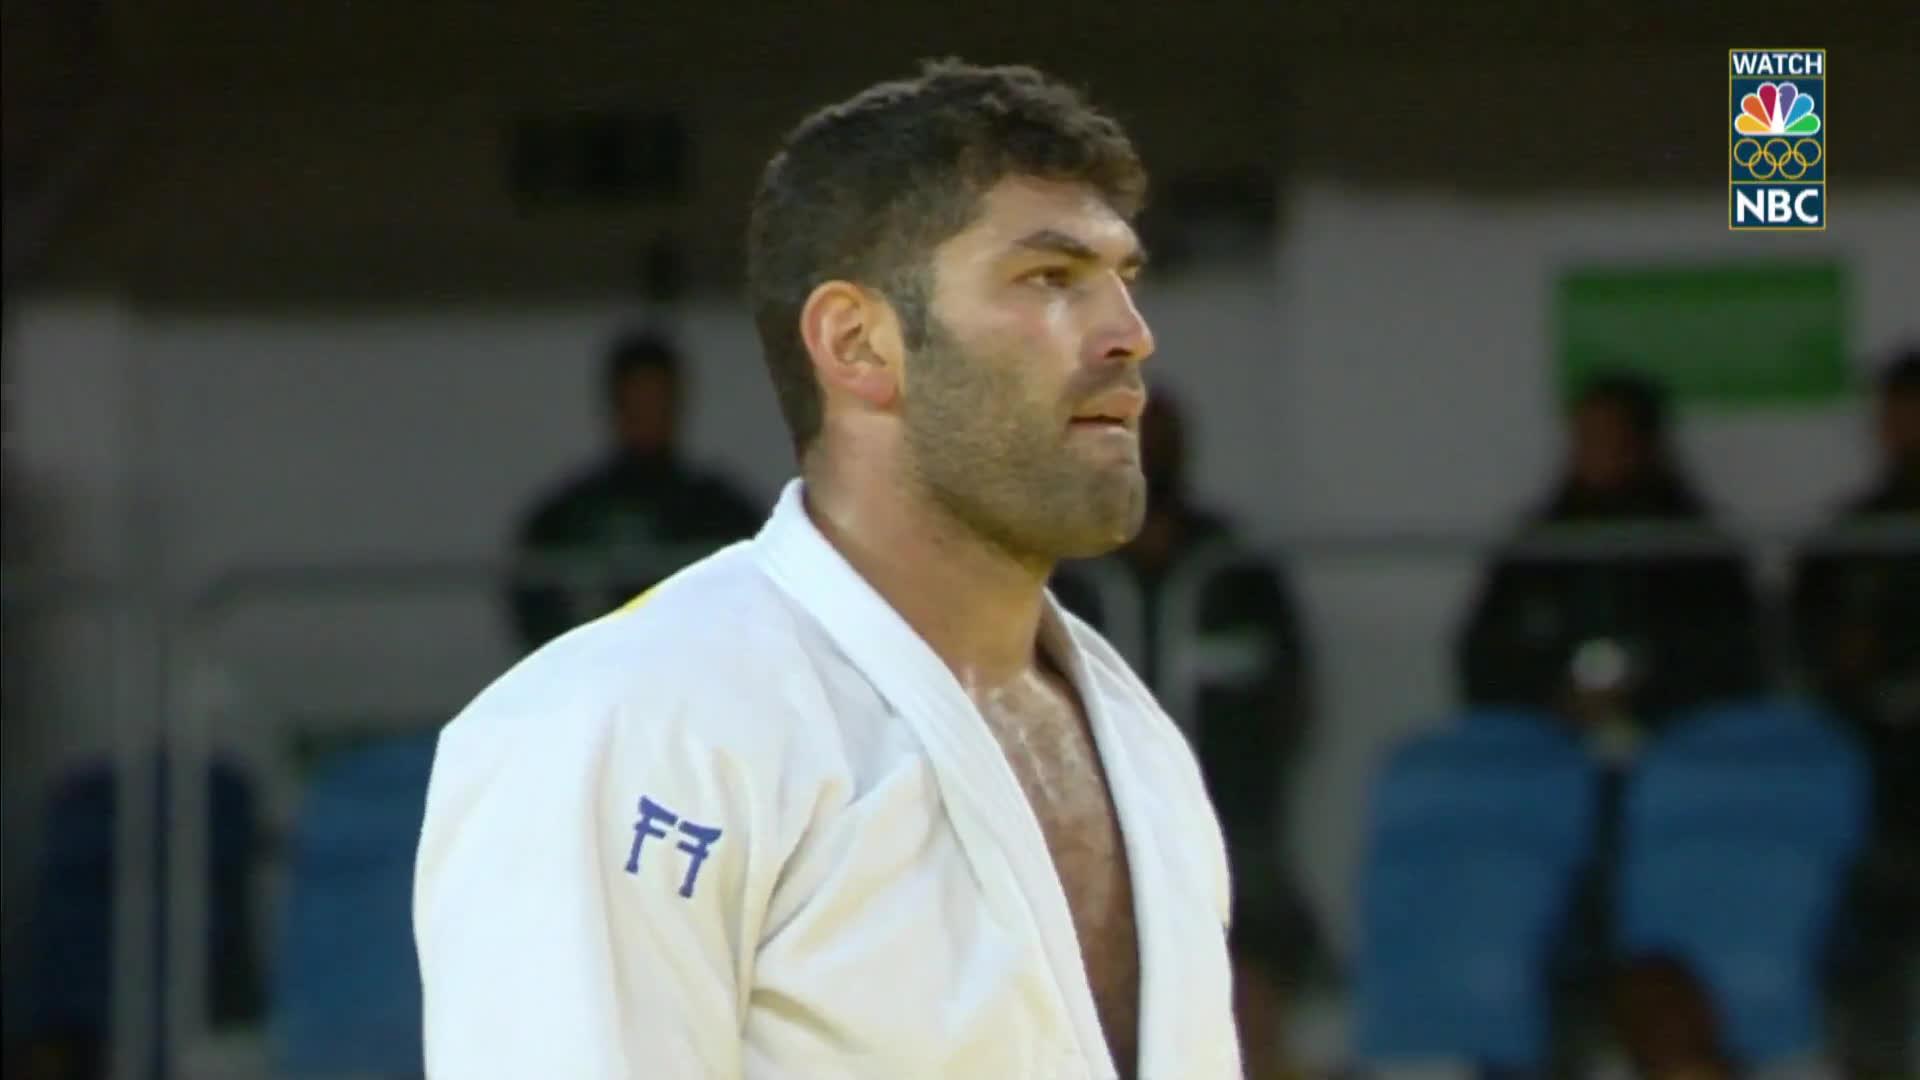 israel, nbc olympics: rio 2016, olymgifs, Egyptian judoka loses to Israeli, refuses to shake hands GIFs